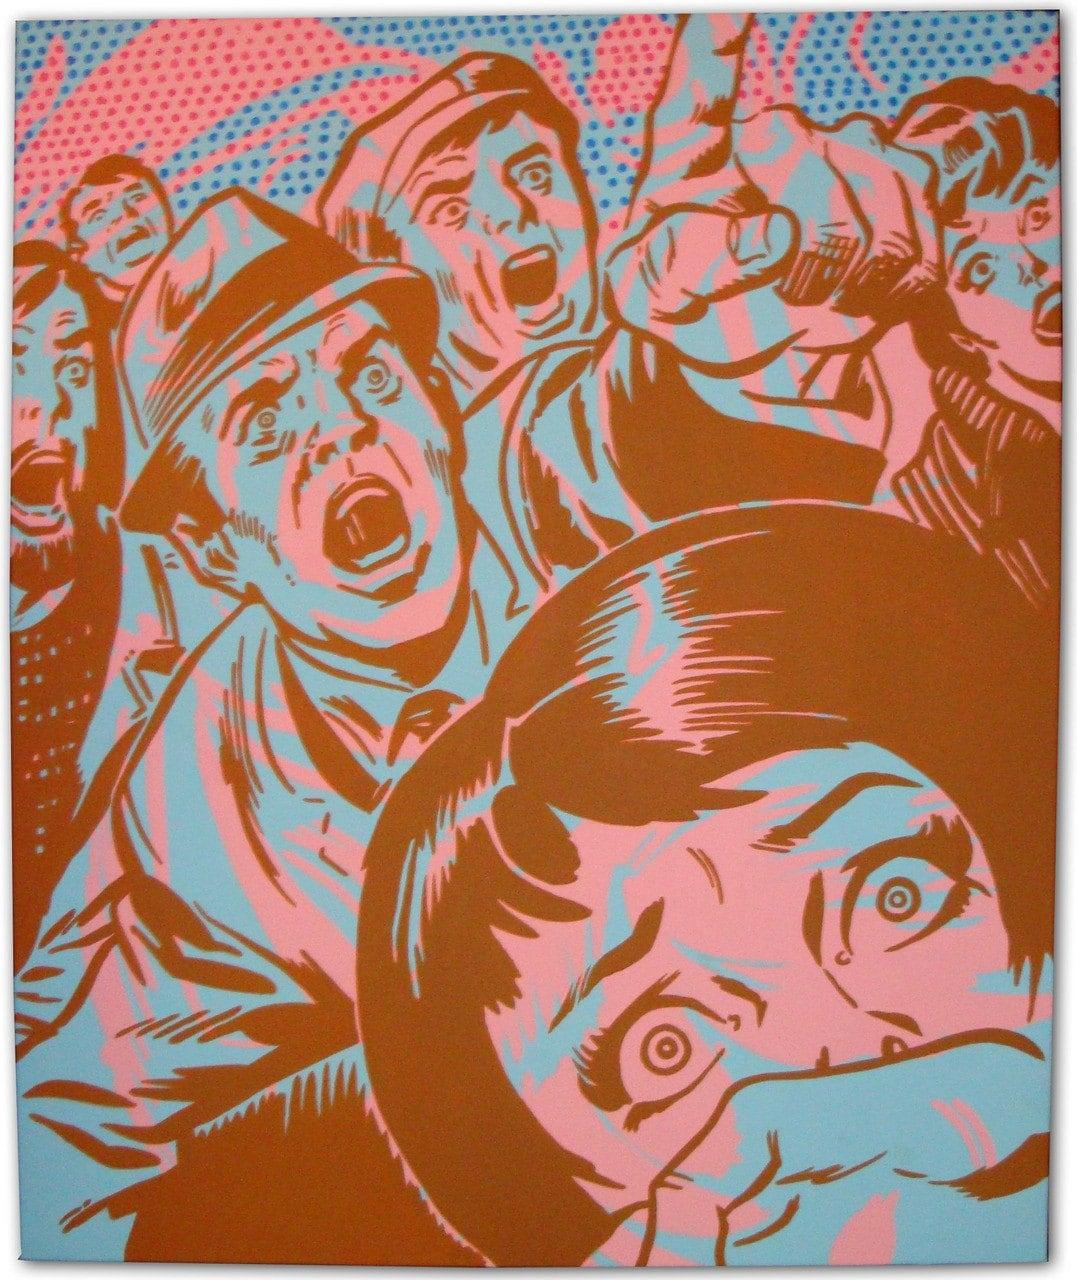 Retro Superhero Art: Vintage Comic Book Pop Art Painting